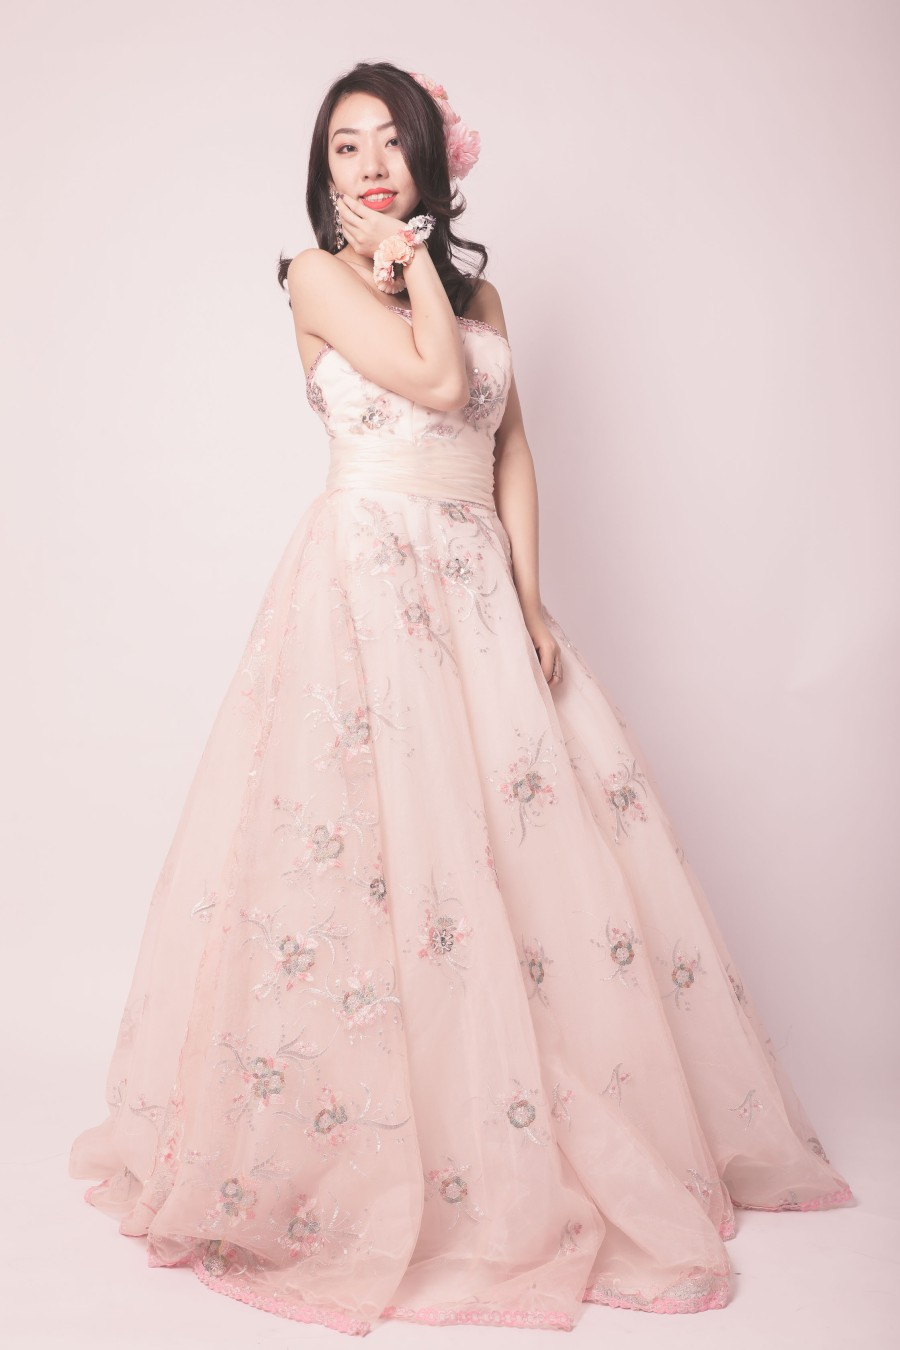 韓式新娘化妝髮型攝影_bridal_wedding_Korea_makeup_hairstyling_Top_MUA_paulstylist_photography_hk-62